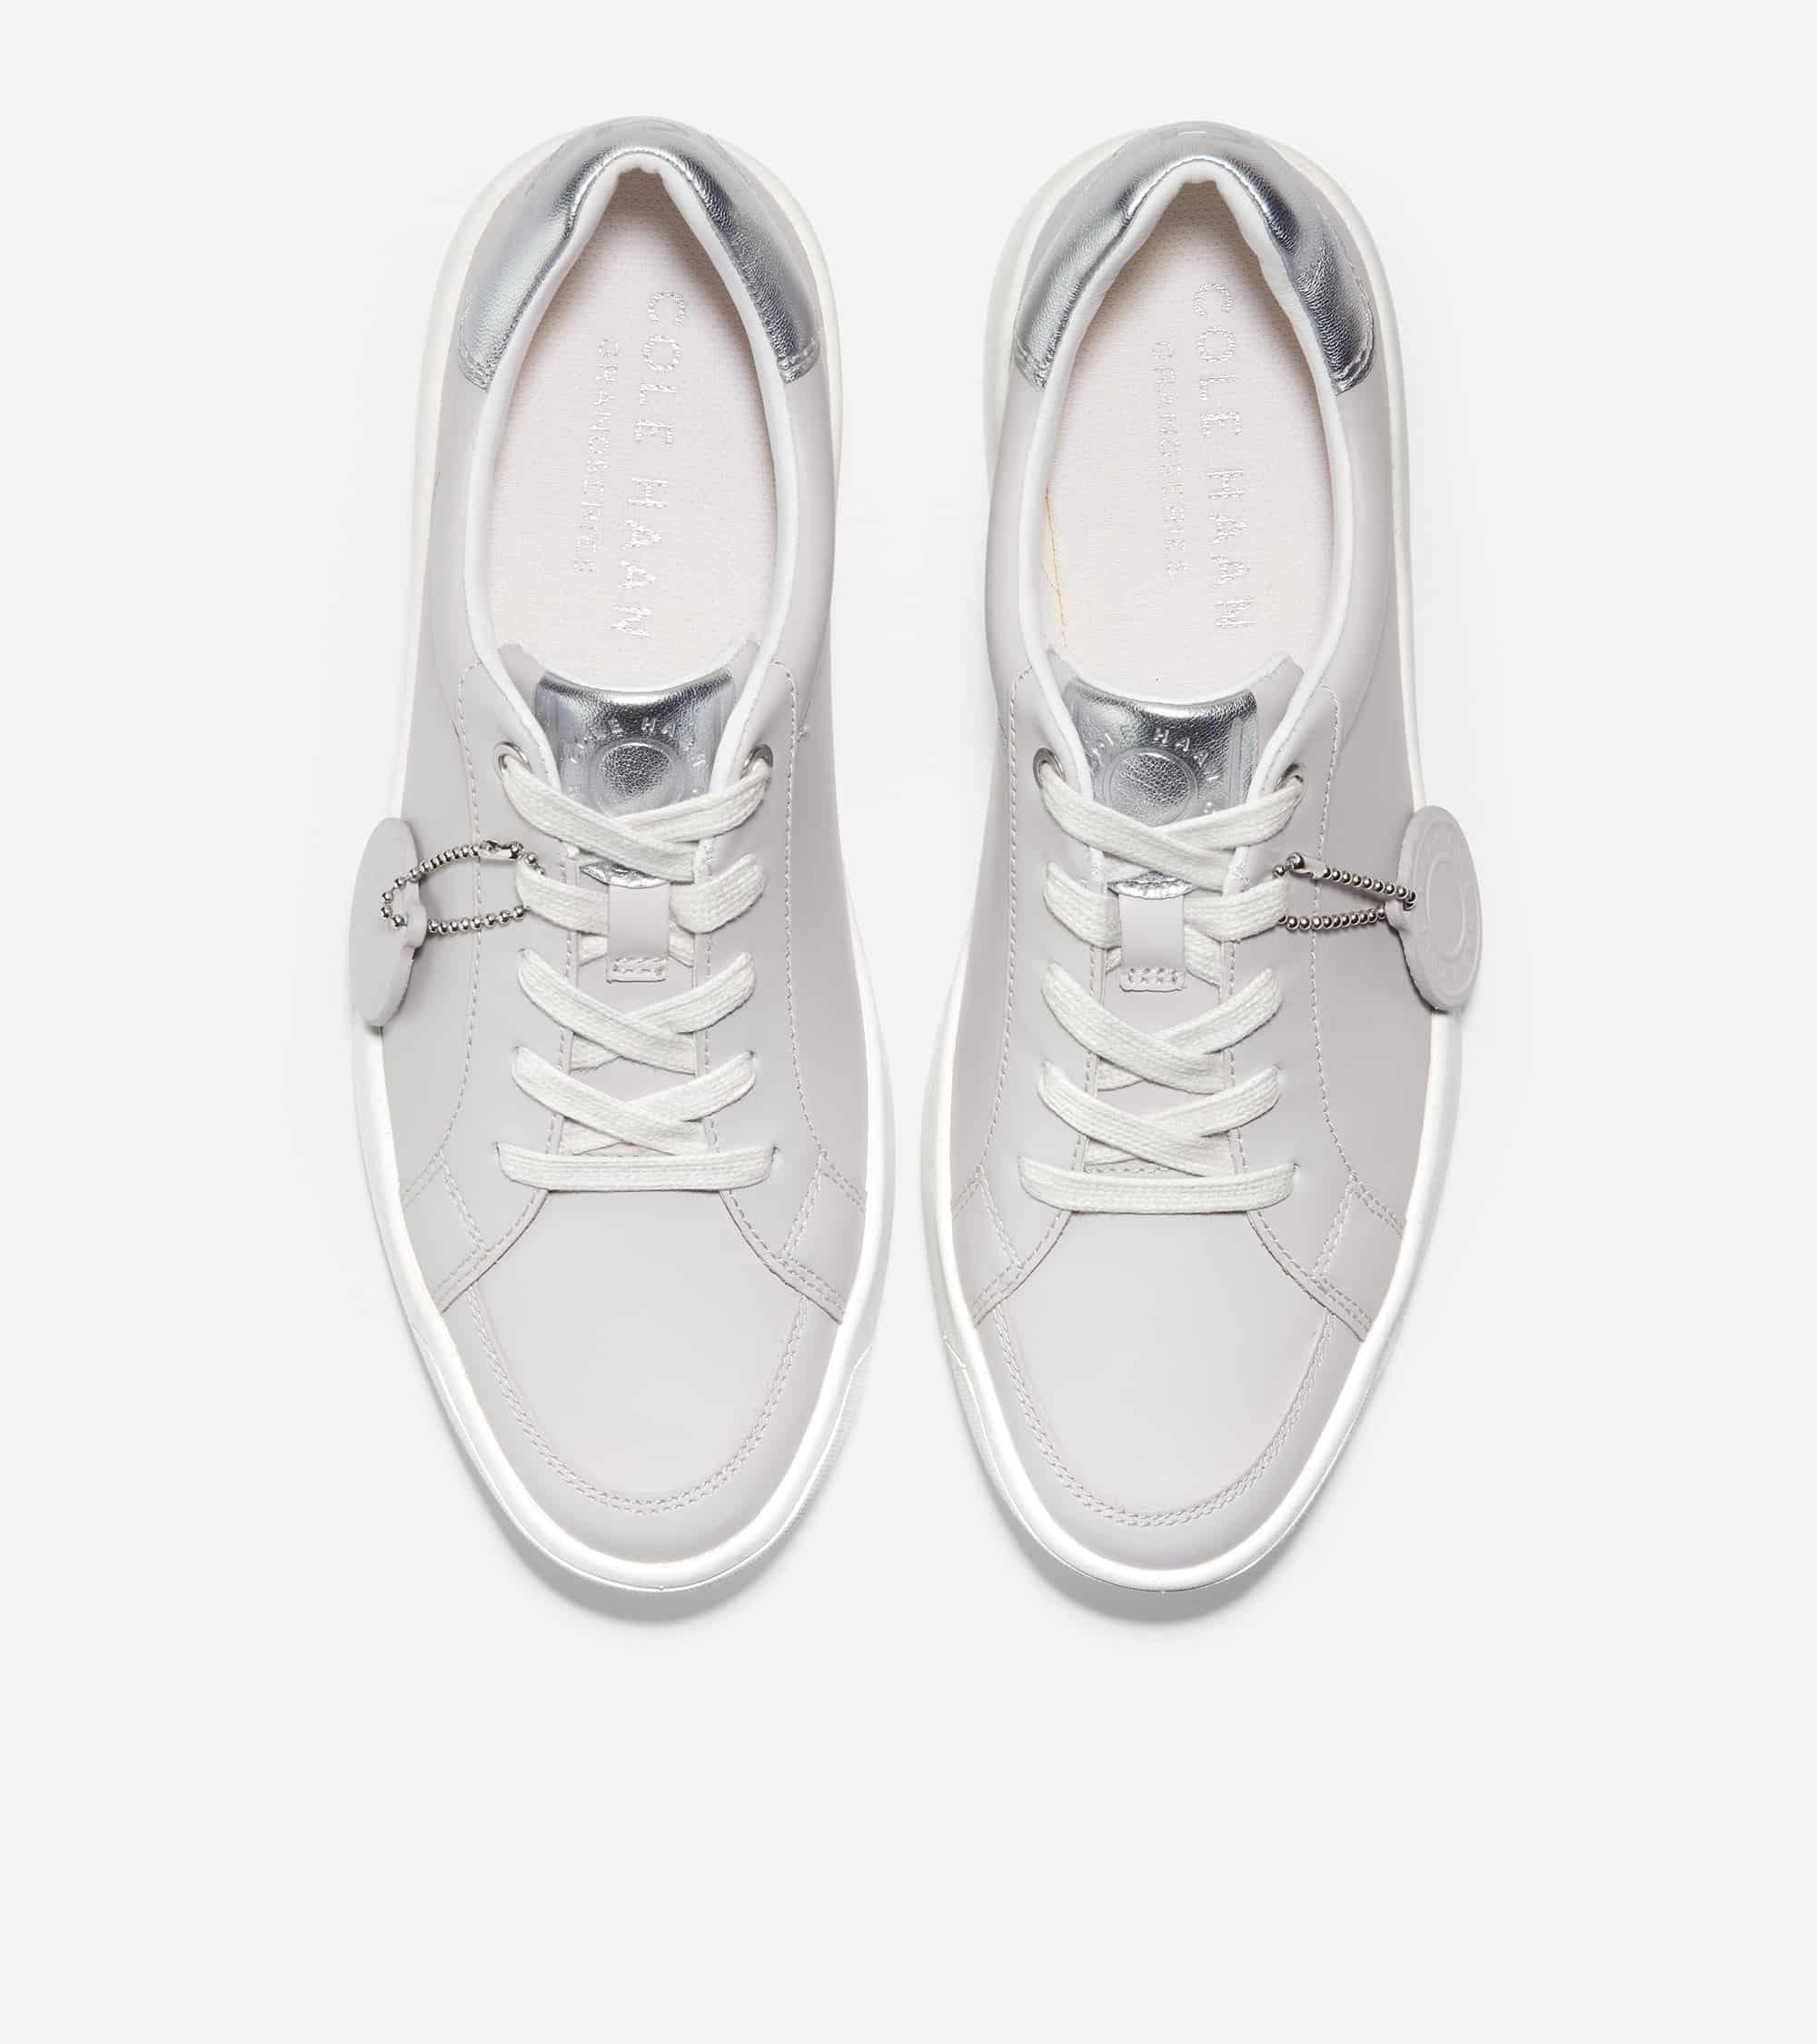 Cole Haan Grandprø Finalist Sneaker Microchip Eco Rebound Leather/ Silver Soft Talca/ White